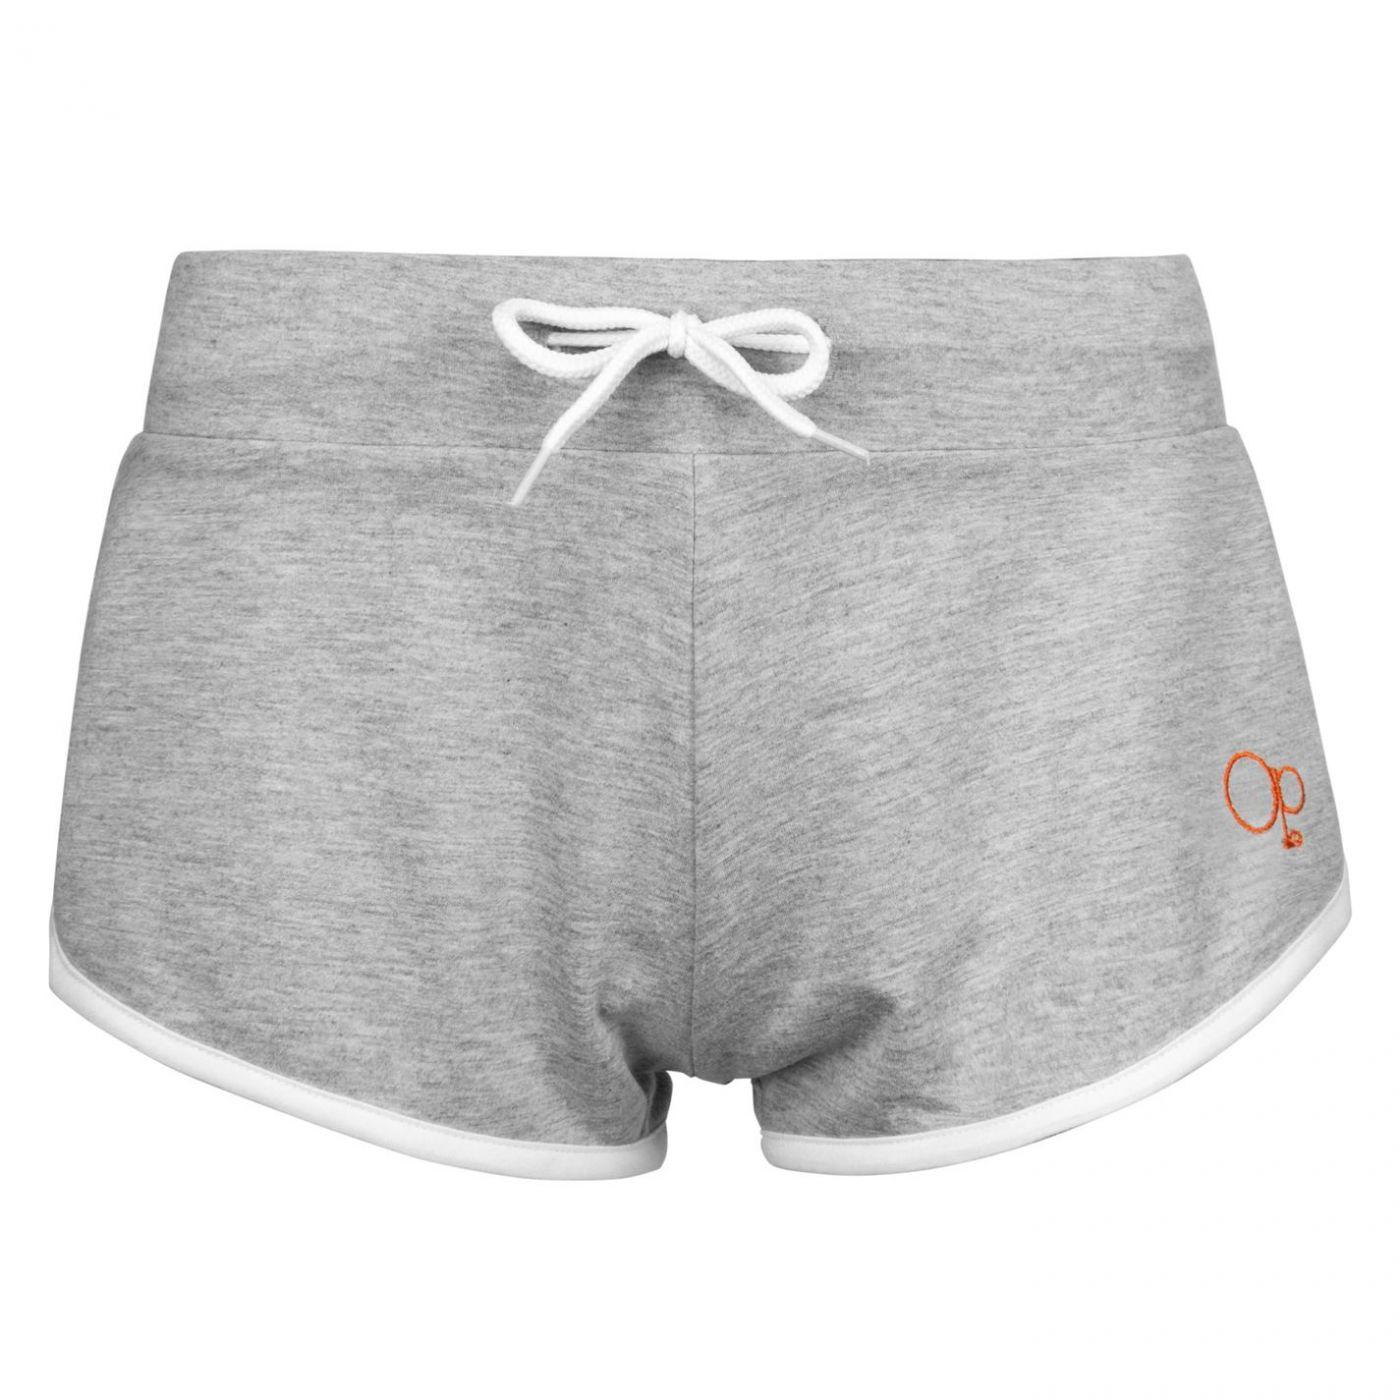 Ocean Pacific Terry Shorts Ladies